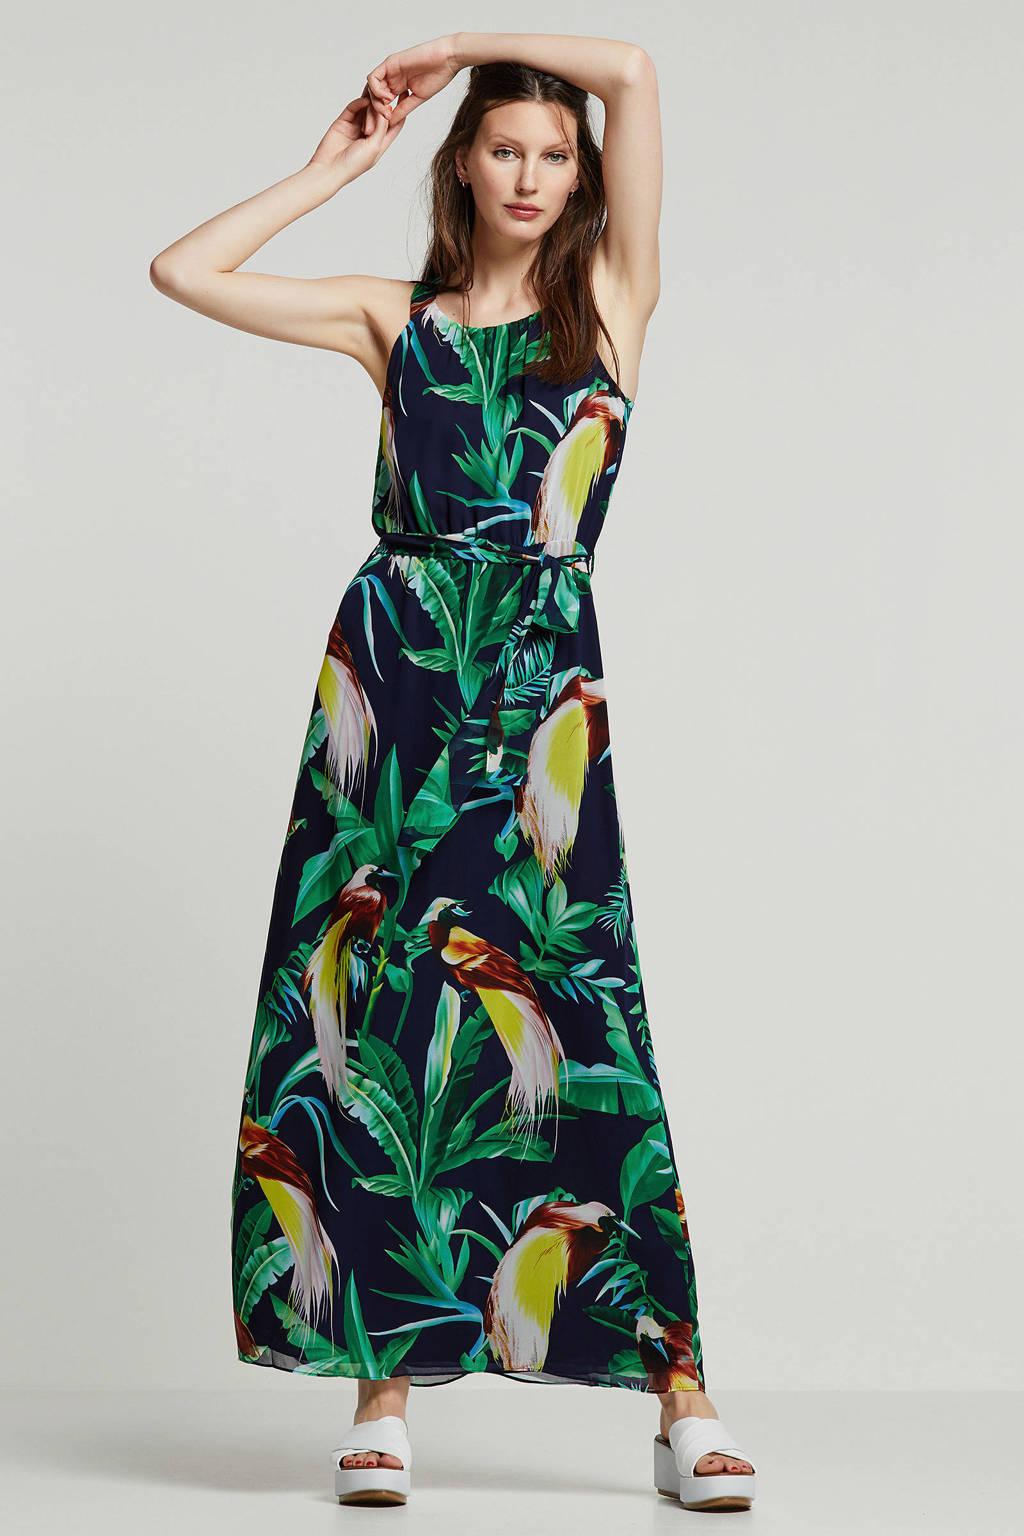 Smashed Lemon jurk met bladprint, Donkerblauw/groen